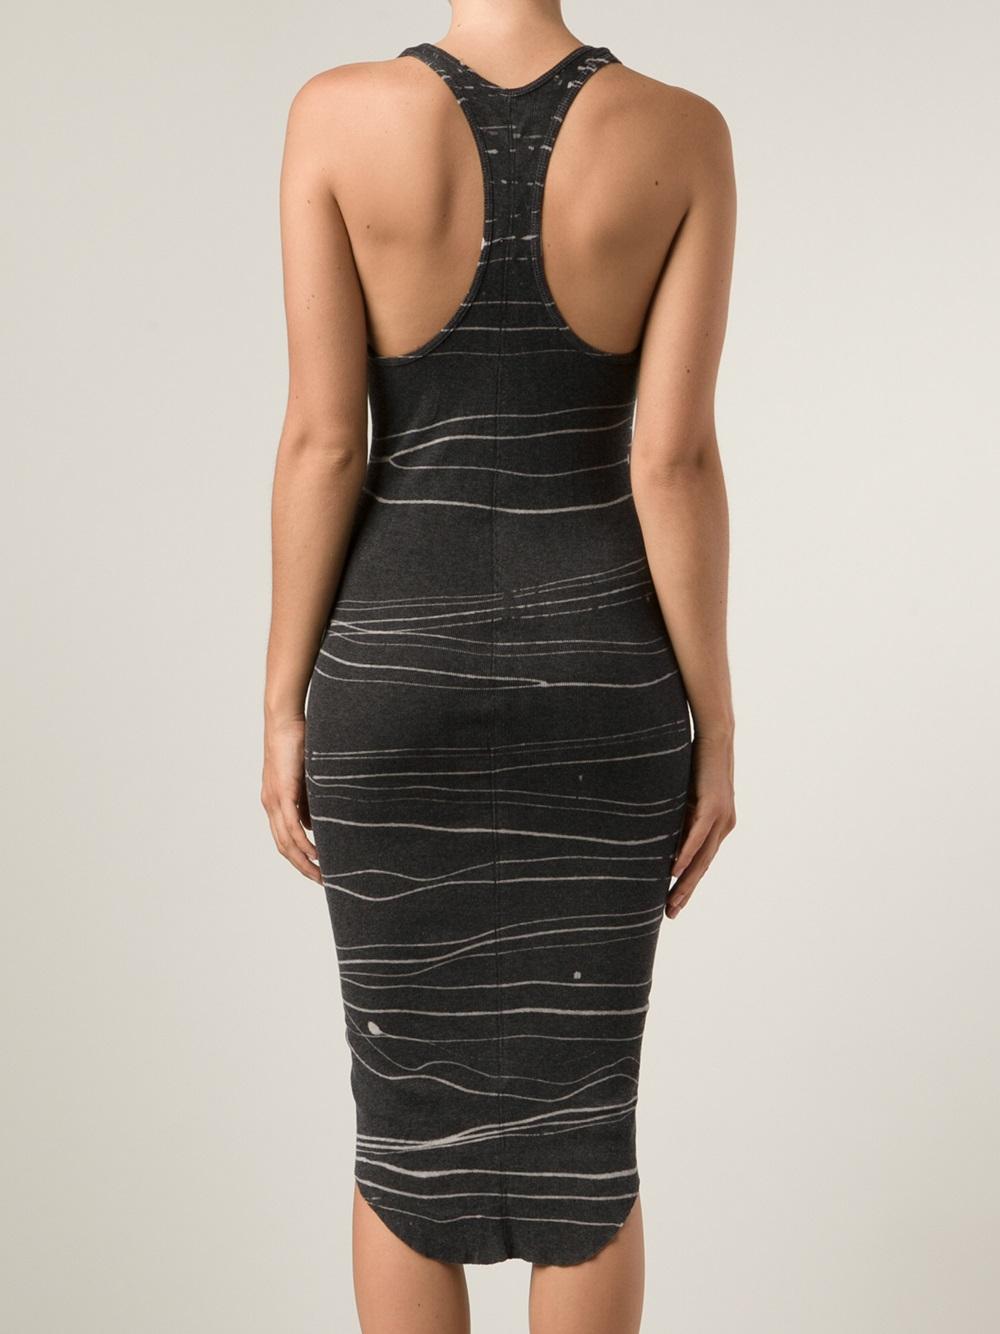 Lyst - Raquel Allegra Wife Beater Dress in Black